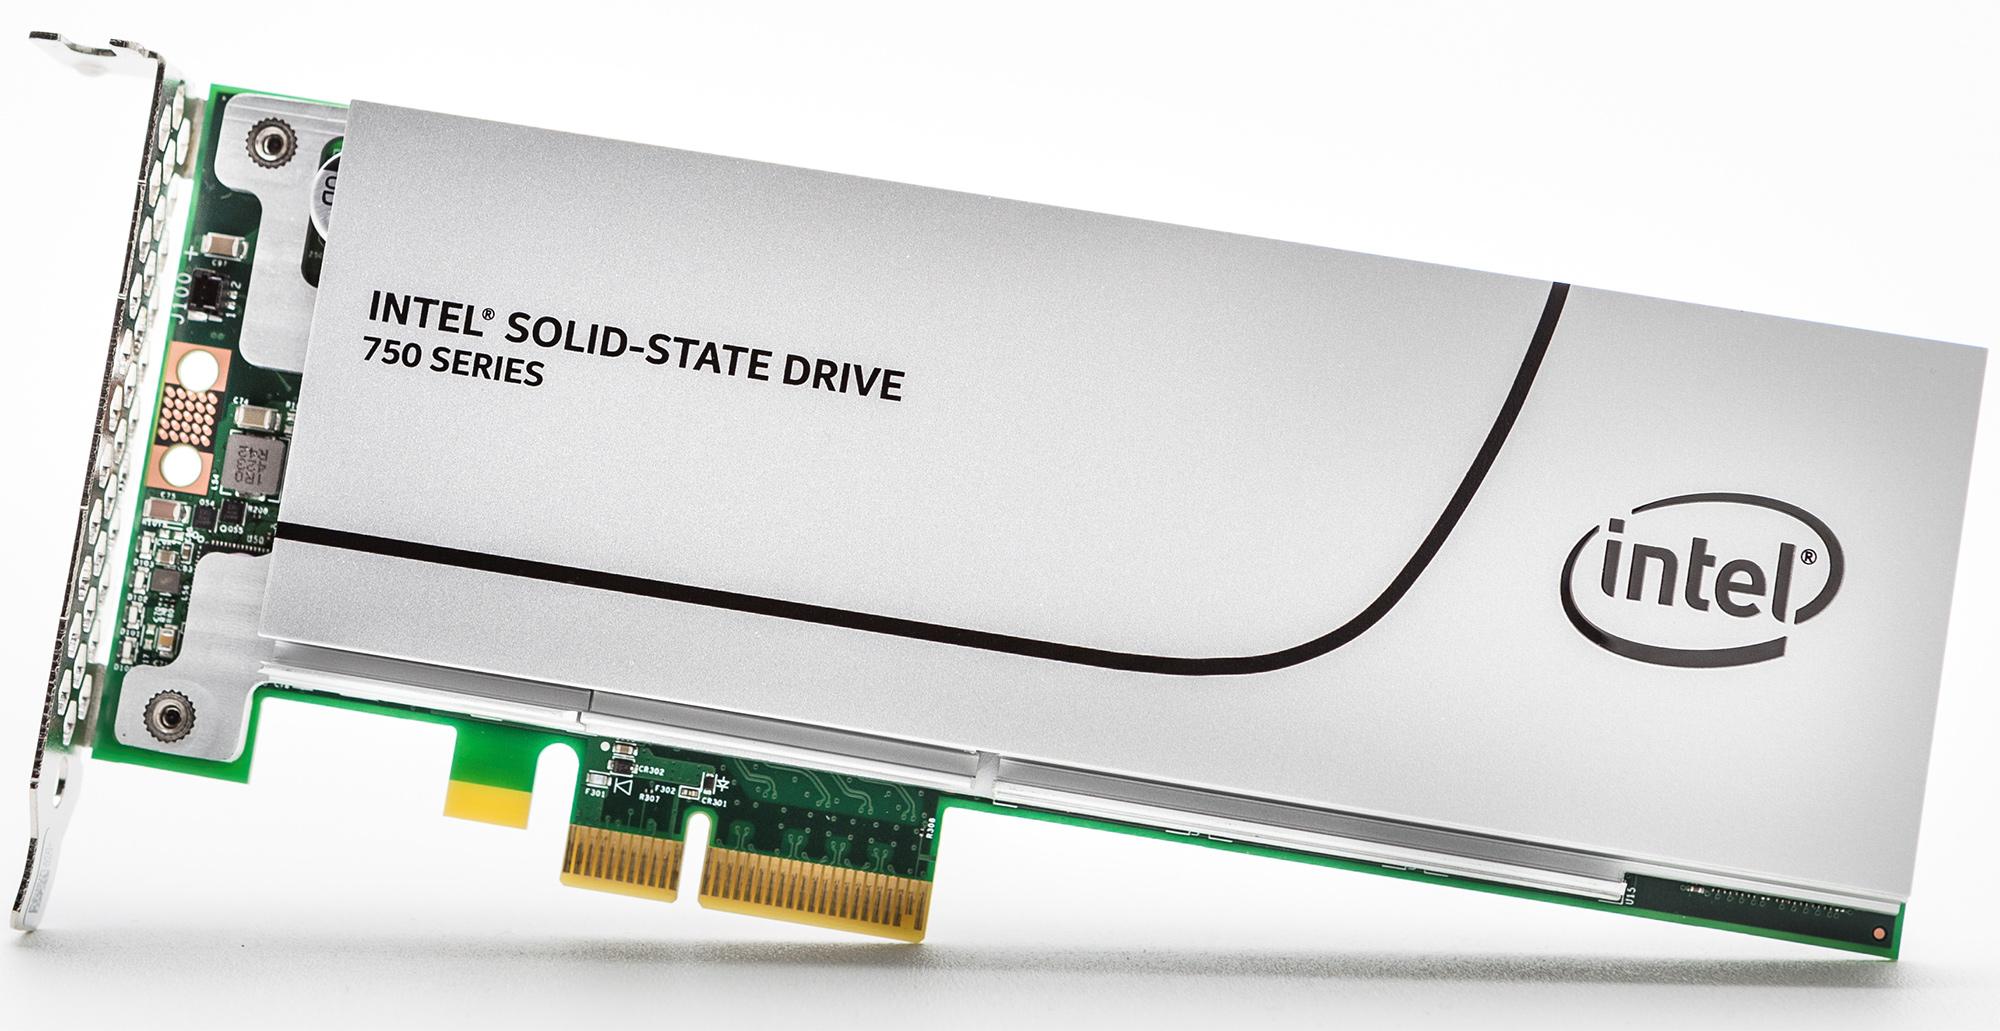 SSD 400GB Intel 750 series 1/2height PCIe 3.0 MLC